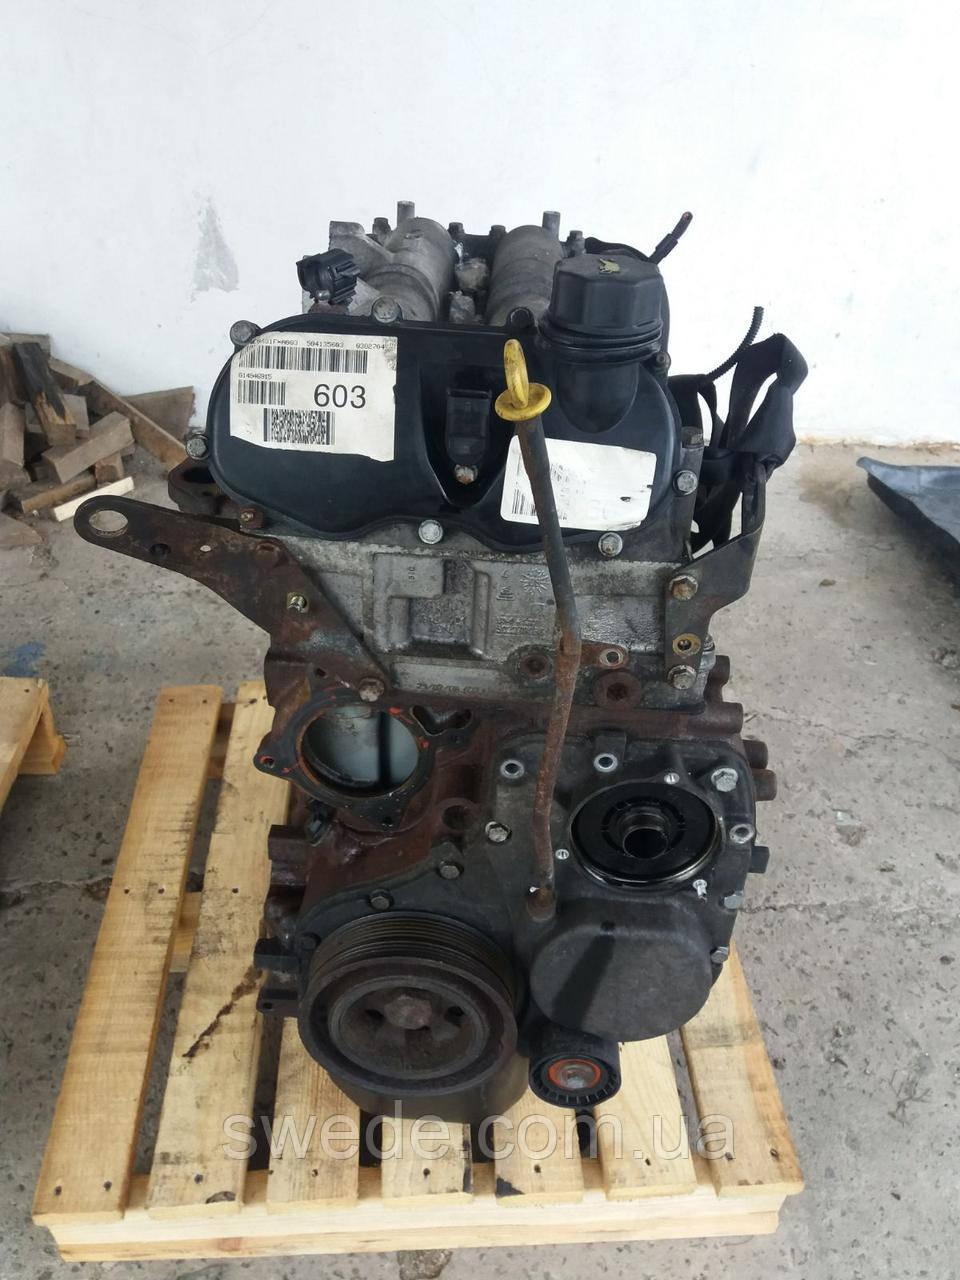 Двигатель Iveco Daily 3.0 HPI 2006-2012 гг F1CE0481F